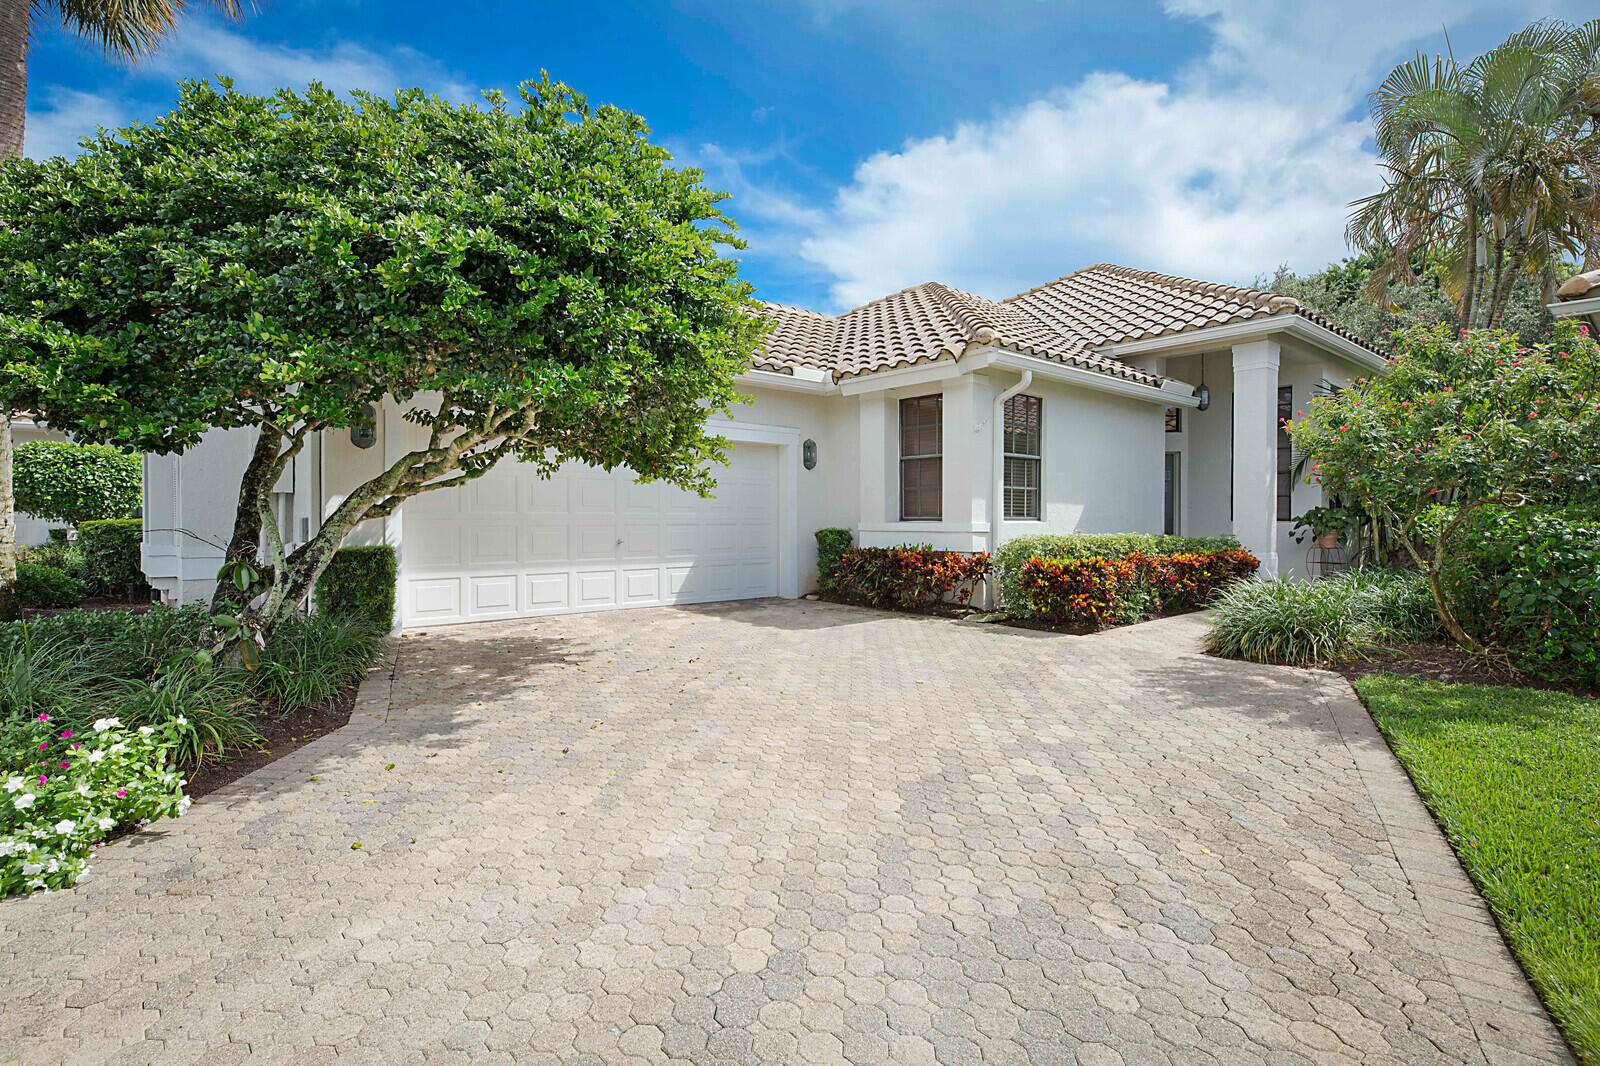 2490 NW 63rd Street Boca Raton, FL 33496